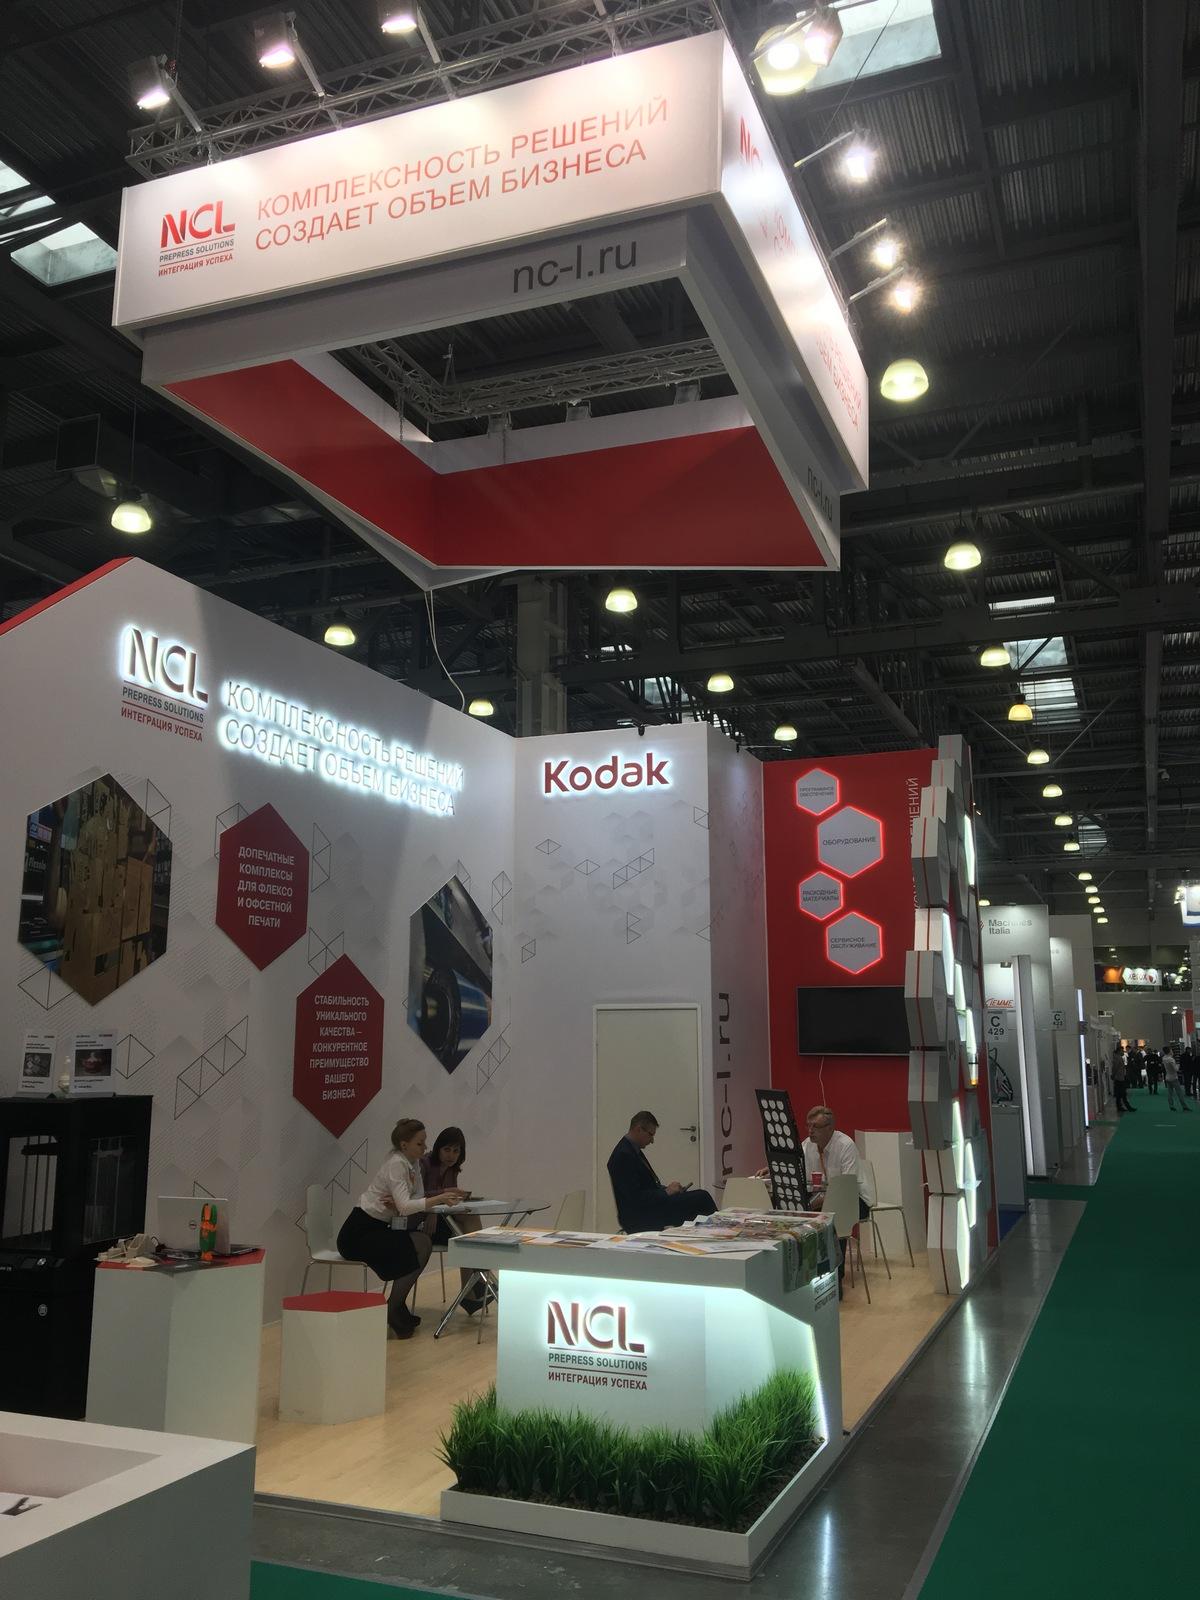 NCL-3